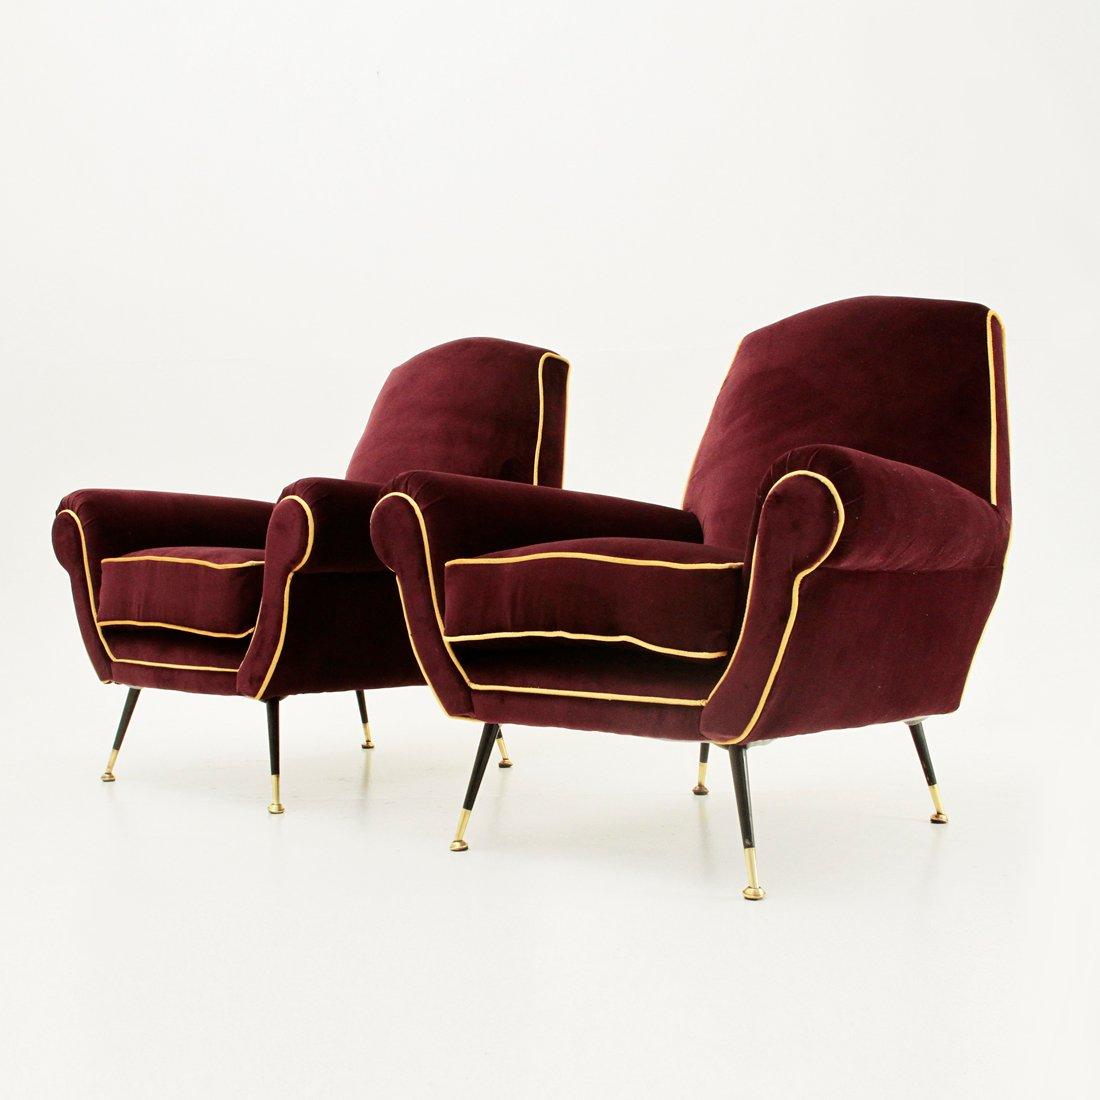 italienische sessel aus samt 1950er 2er et bei pamono kaufen. Black Bedroom Furniture Sets. Home Design Ideas